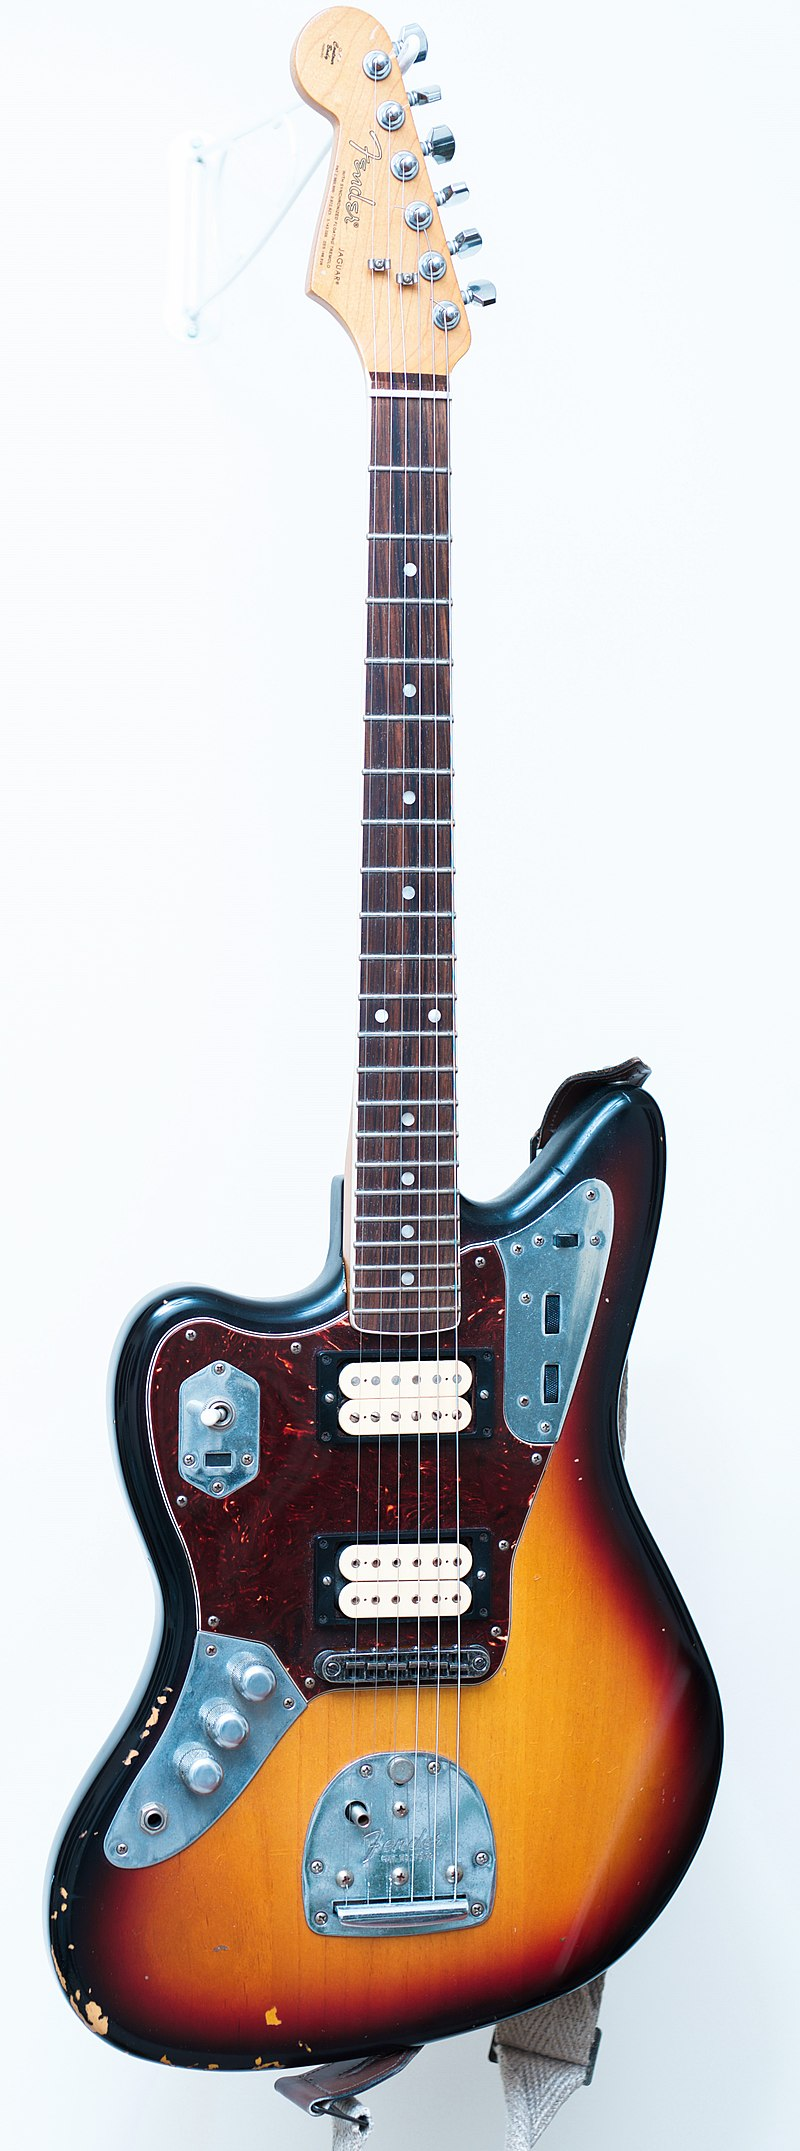 Fender Jaguar II.jpg